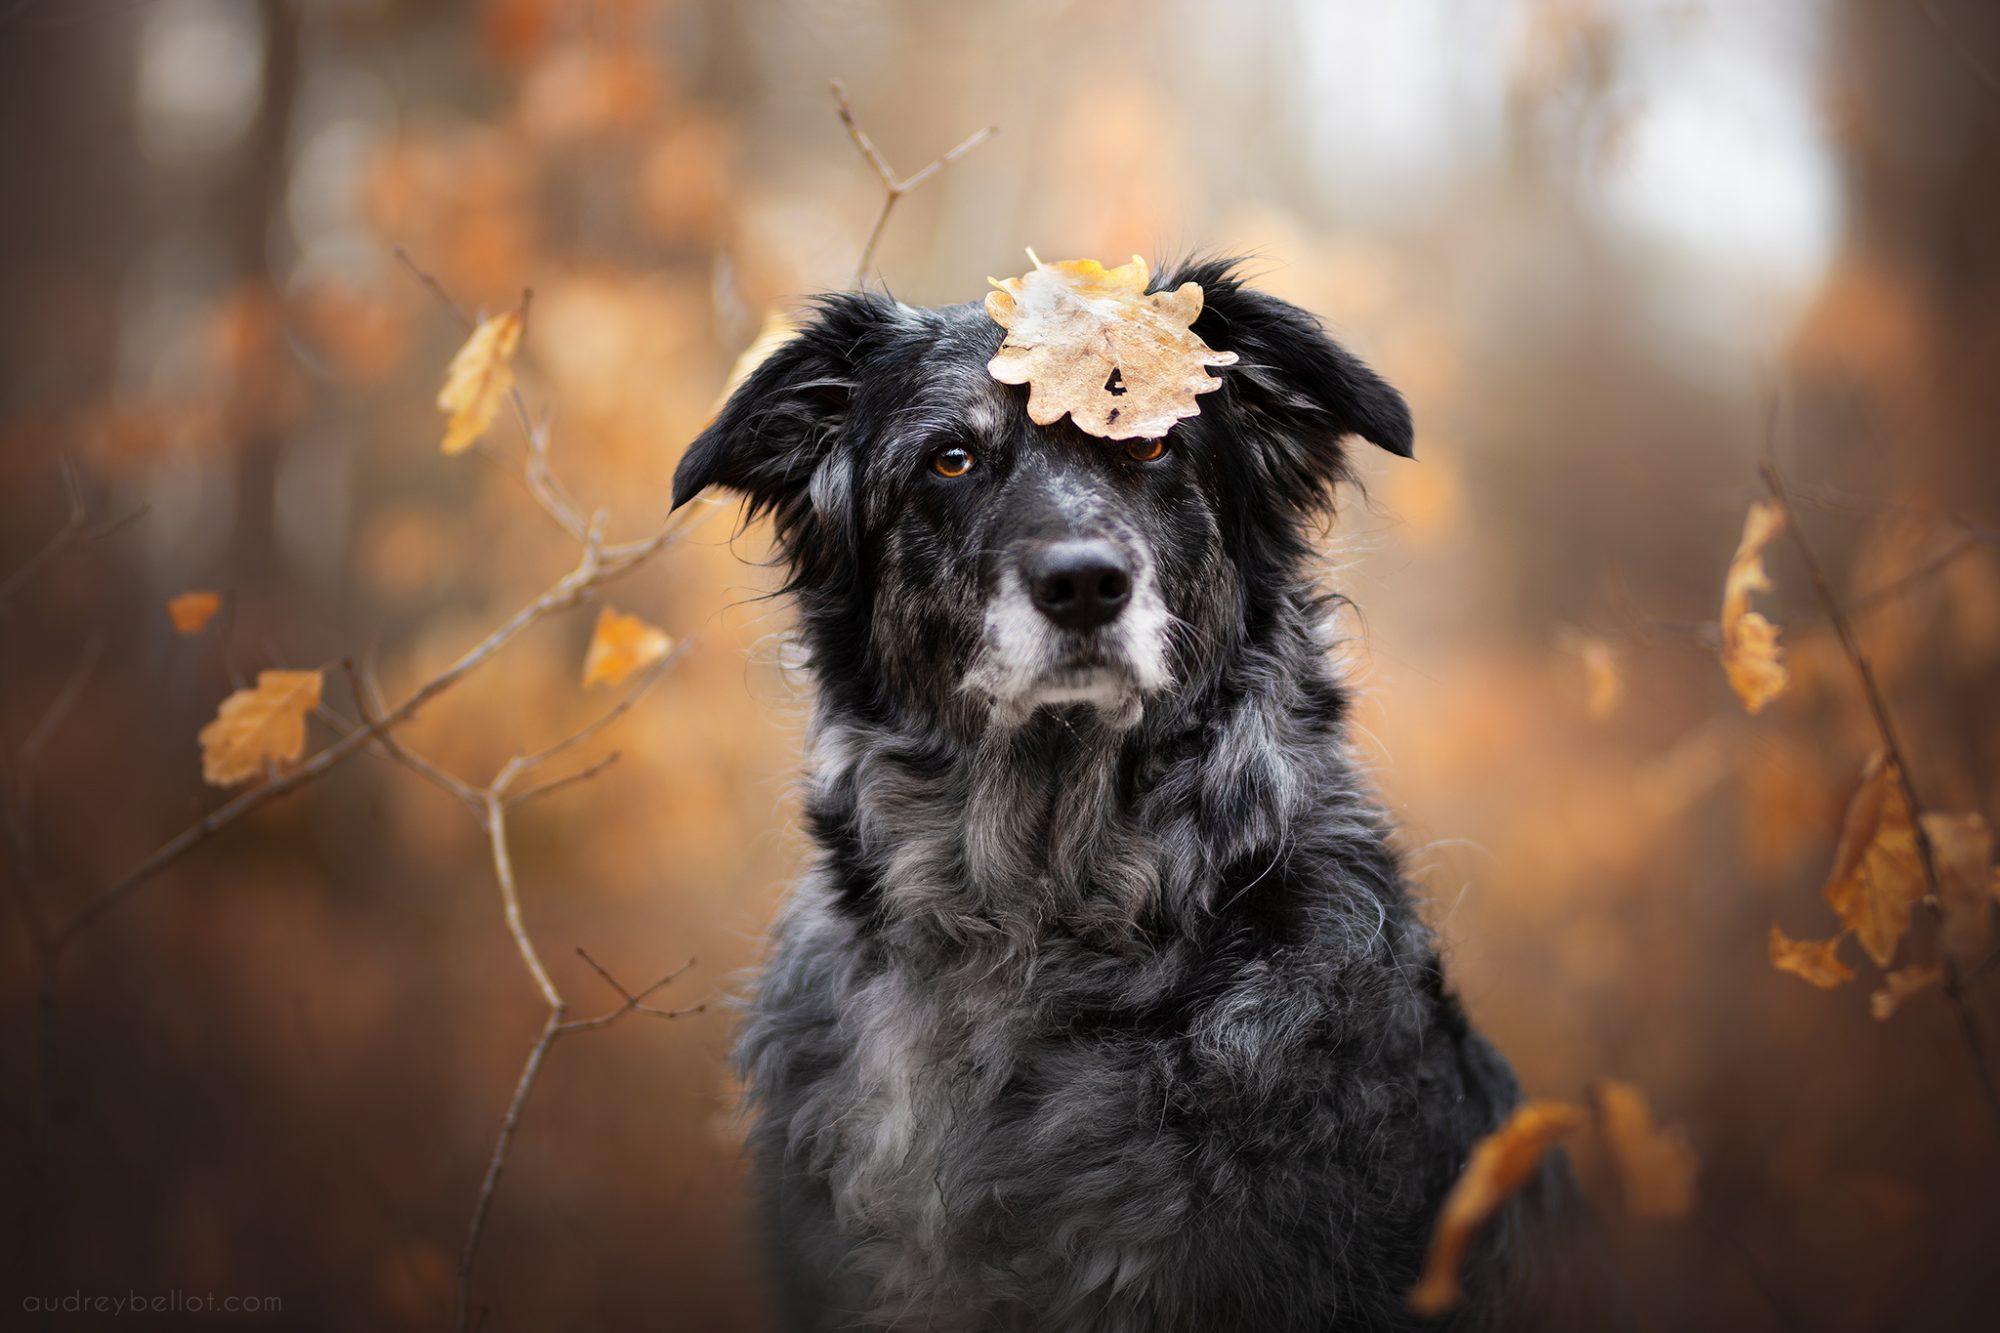 workshop photographie canin france belgique audrey bellot photographe canin professionnel stage photo chiens